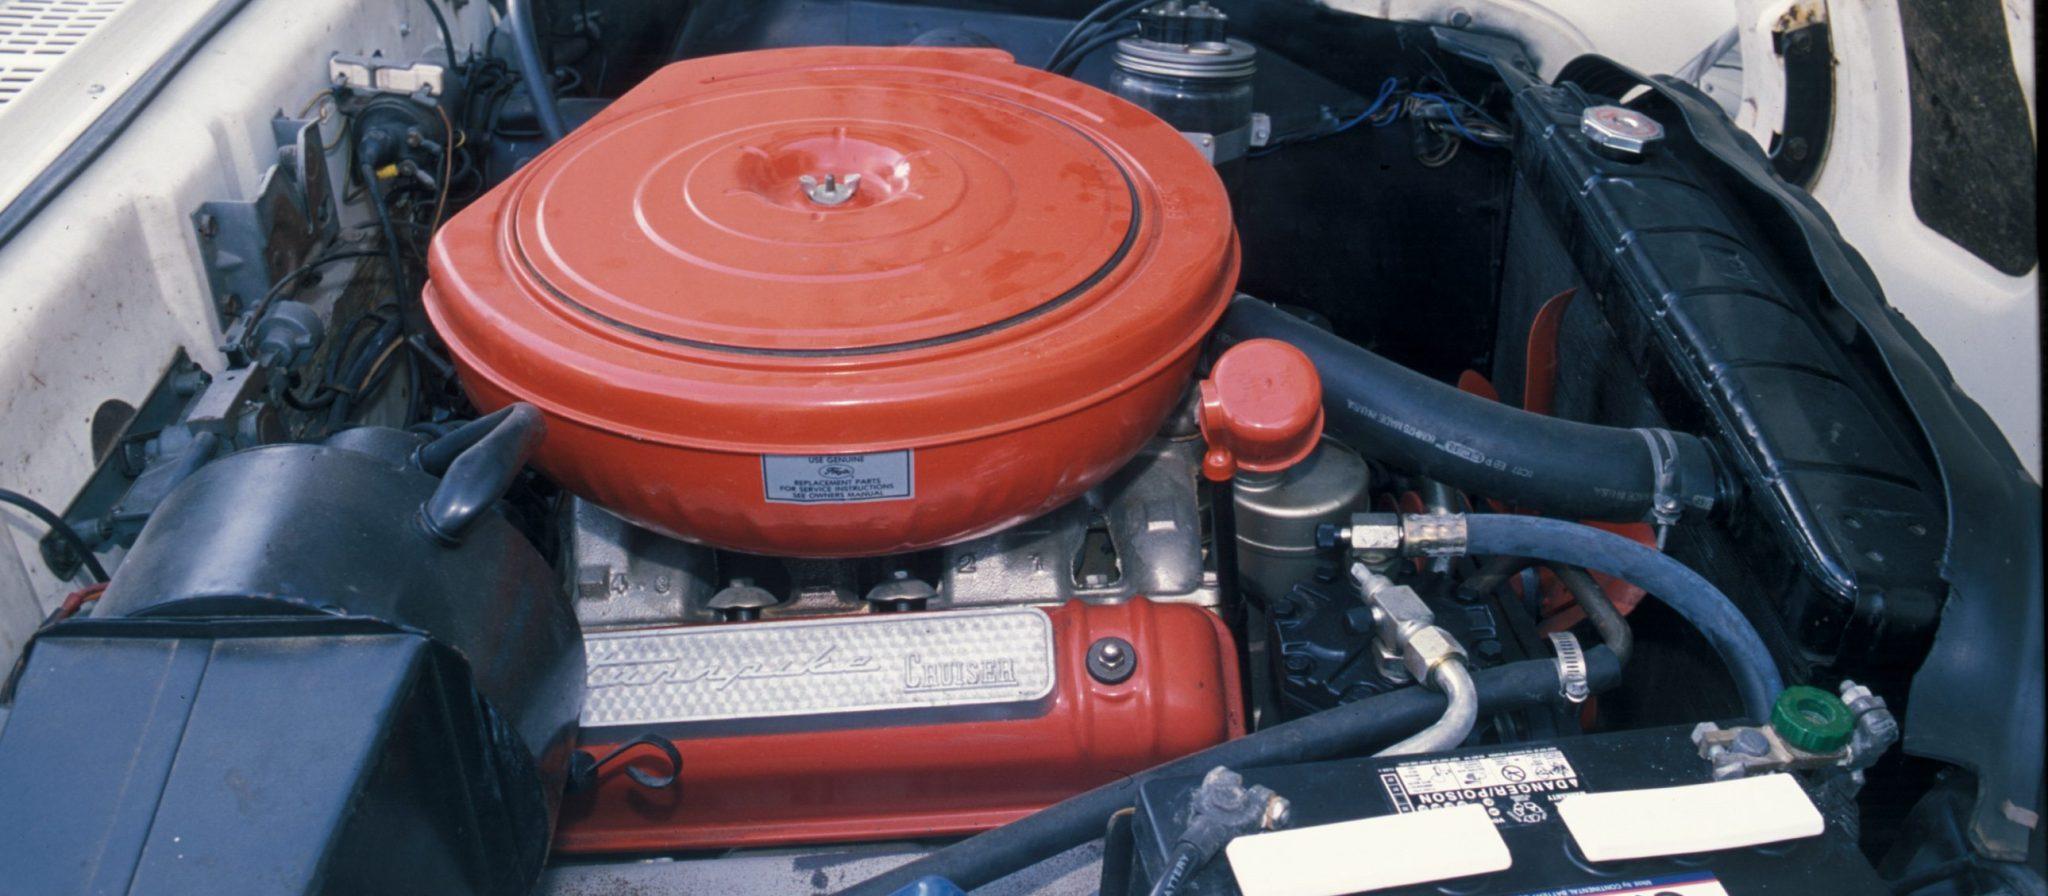 1957 Mercury Colony Park 368cid V8